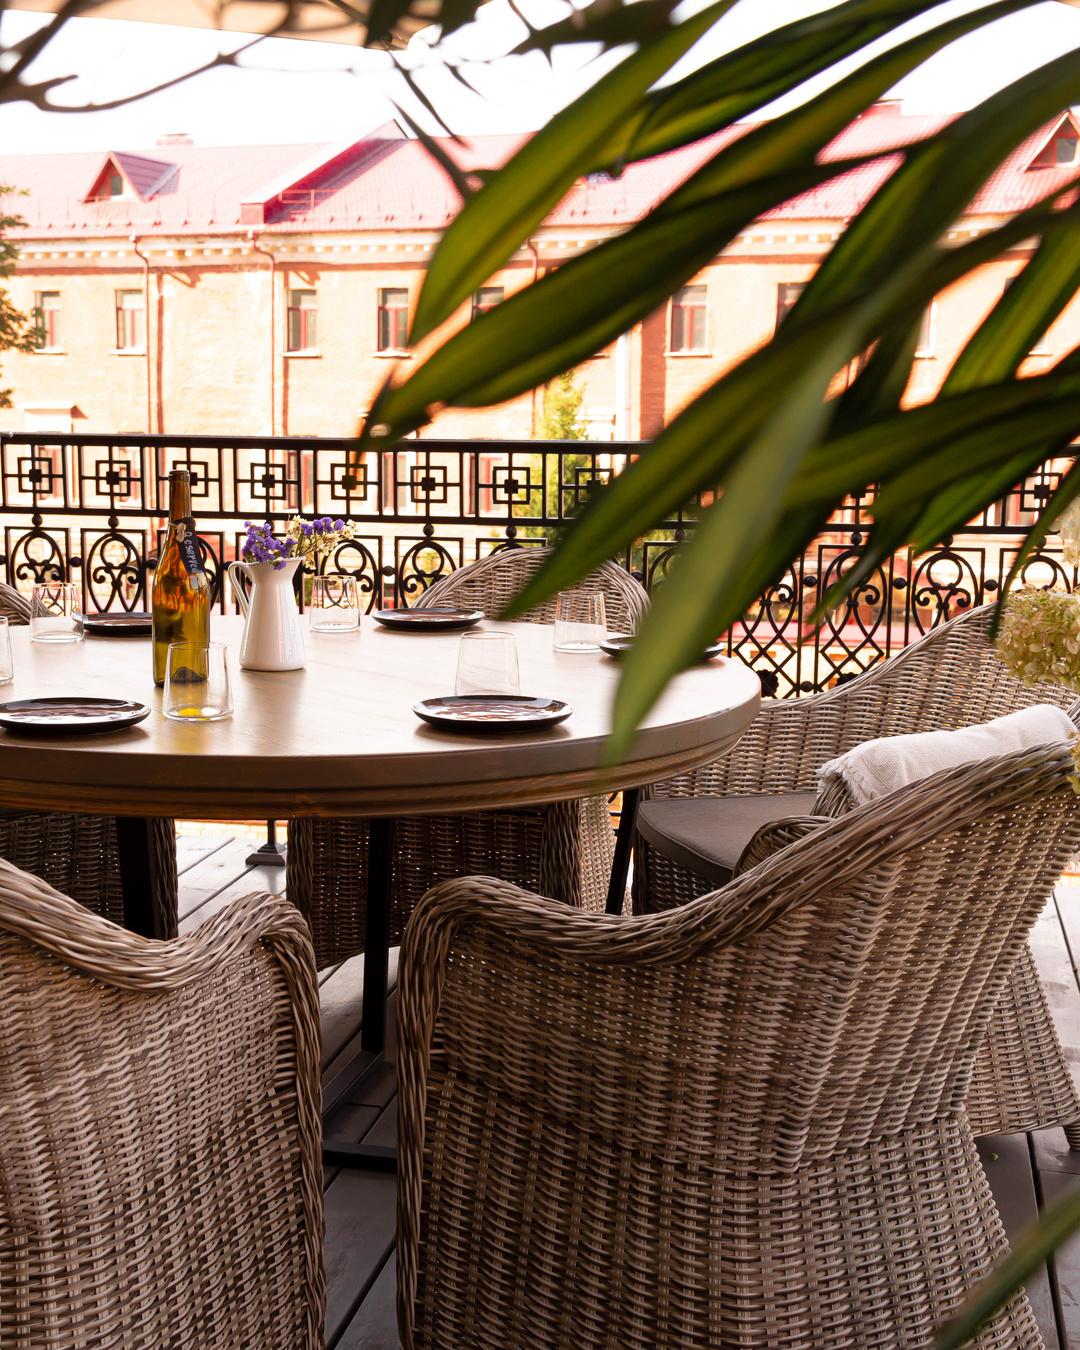 Ресторан Red Wall, Нижний Новгород